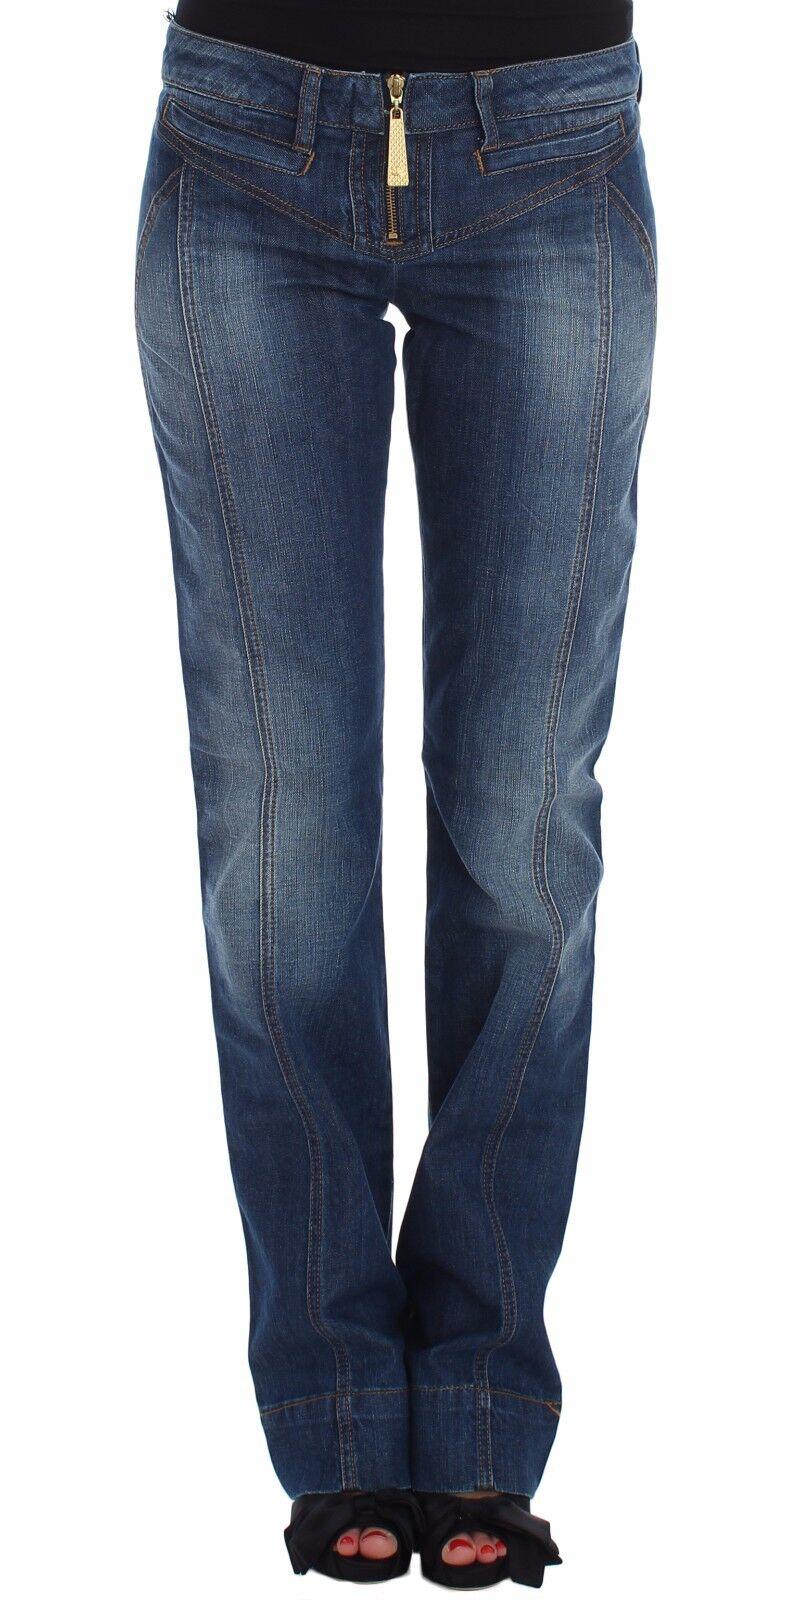 NWT JUST CAVALLI Jeans Pants bluee Wash Cotton Stretch Boot Cut Denim s. W28